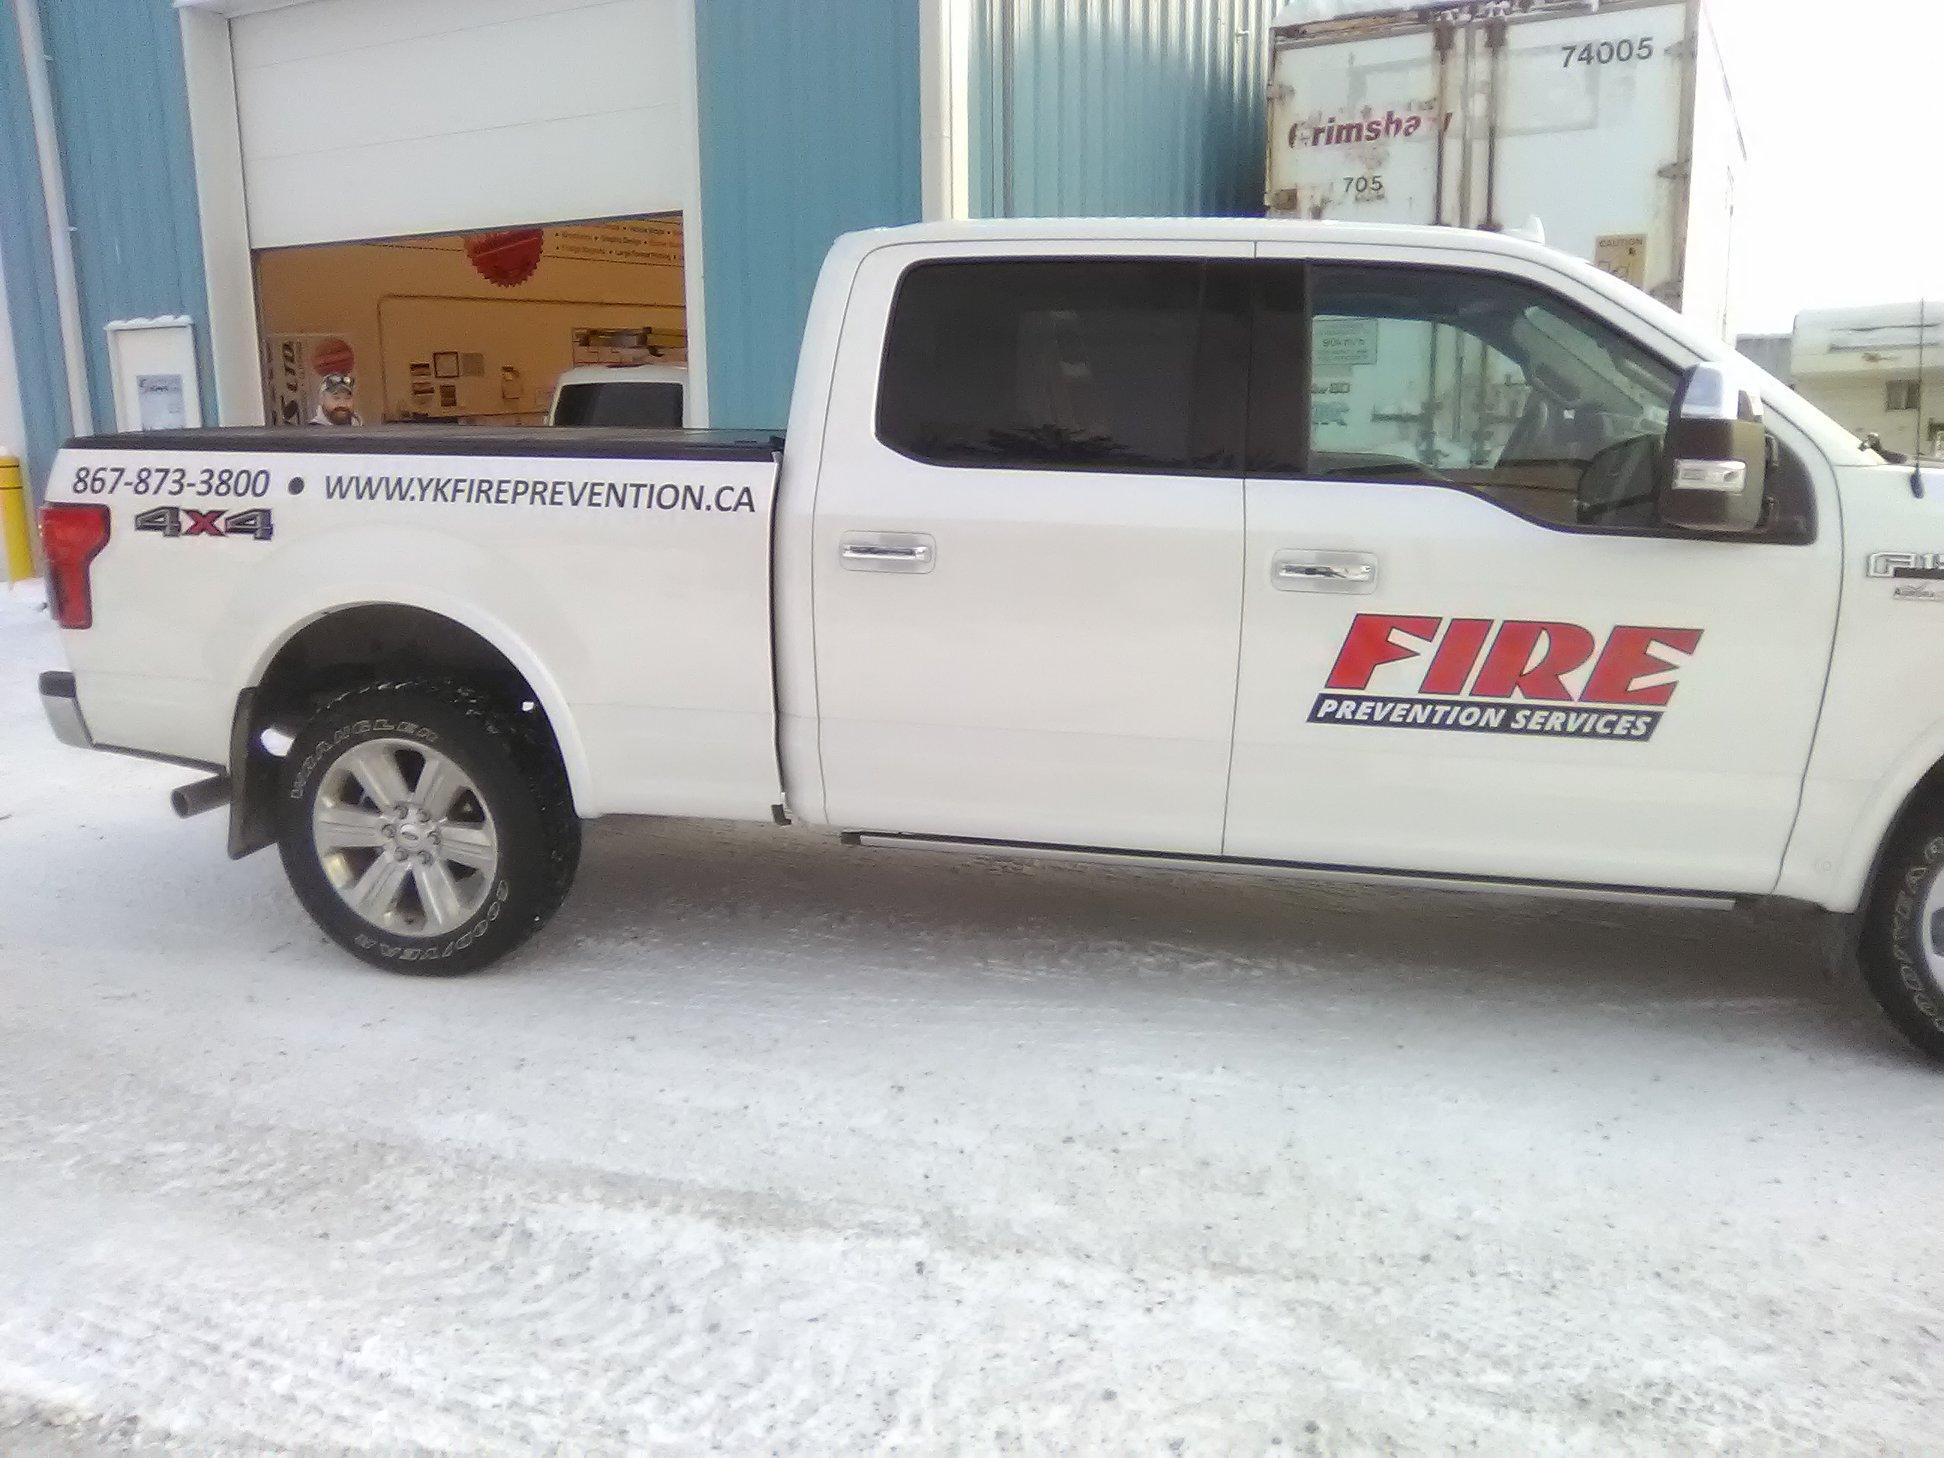 New Fire Prevention Services Fleet Decals